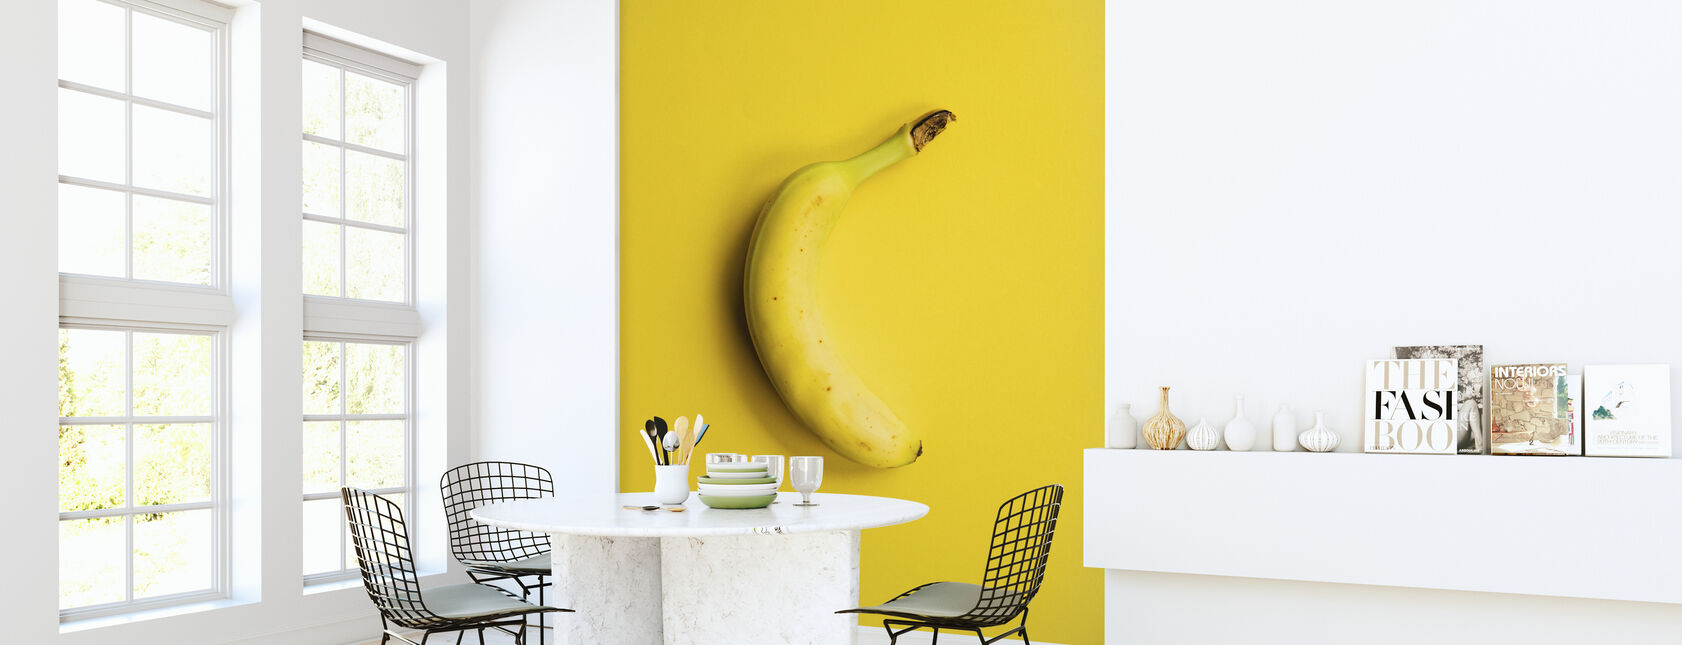 Yellow Banana - Wallpaper - Kitchen